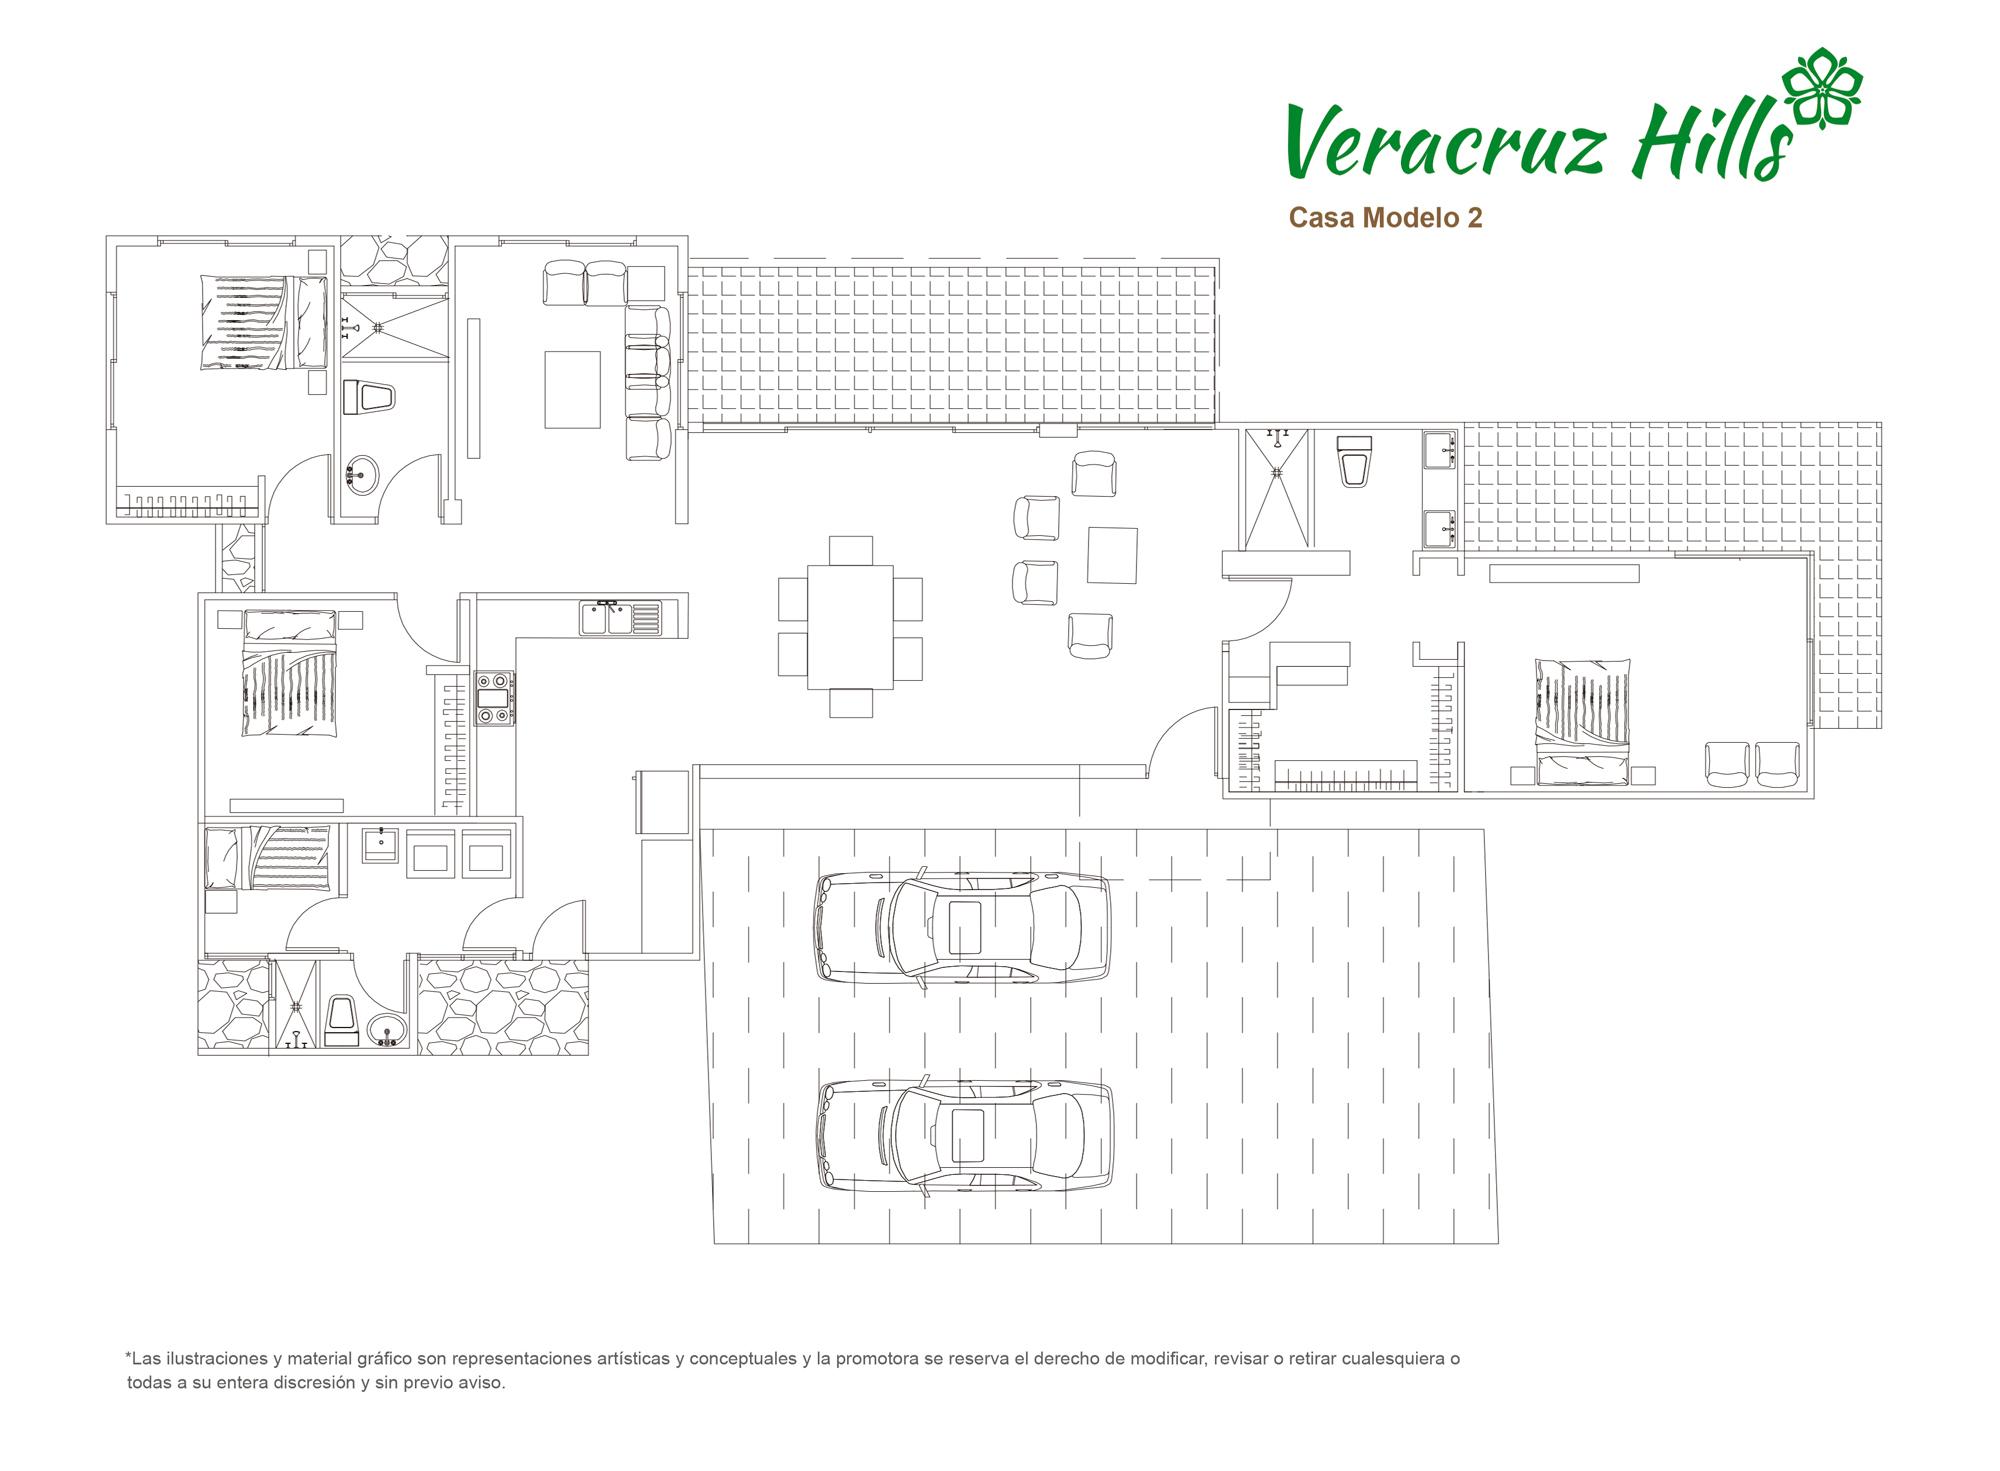 Veracruz Hills - Modelo 2